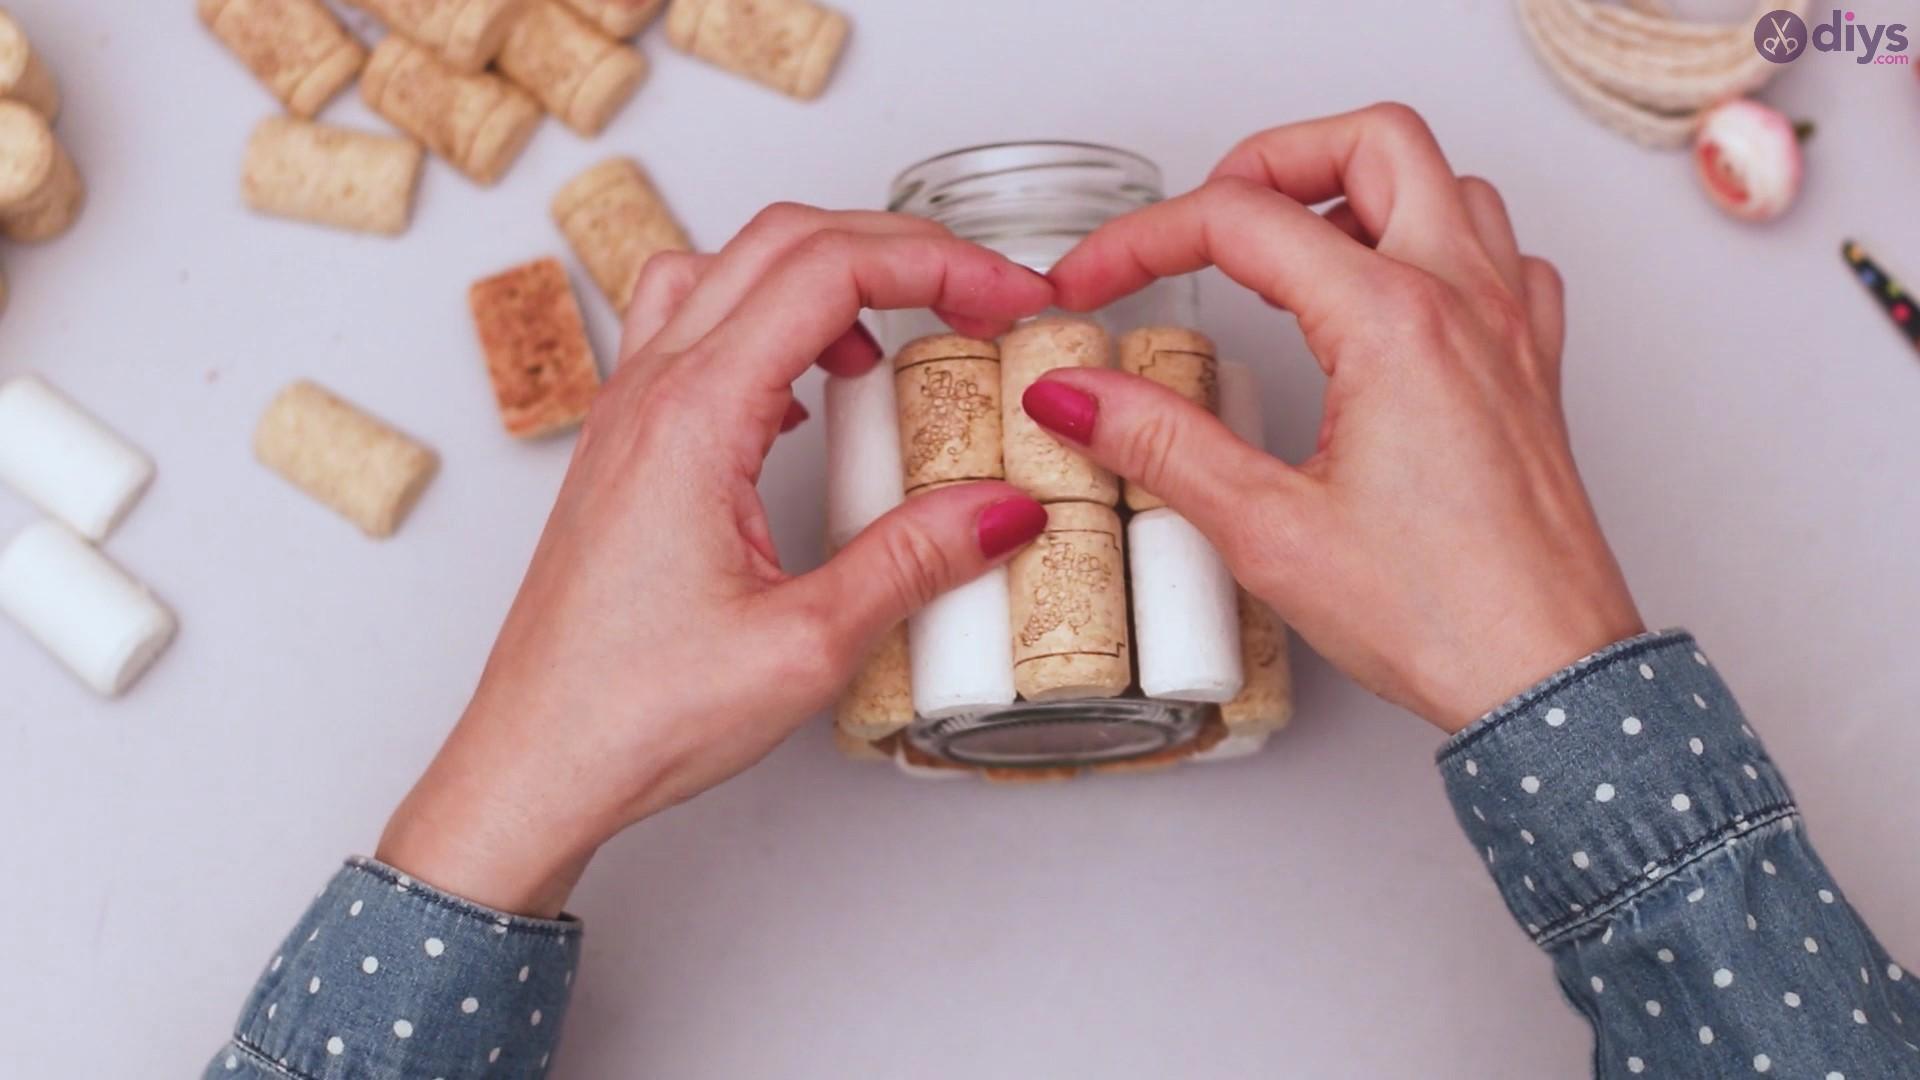 Diy wine cork flower vase (14)